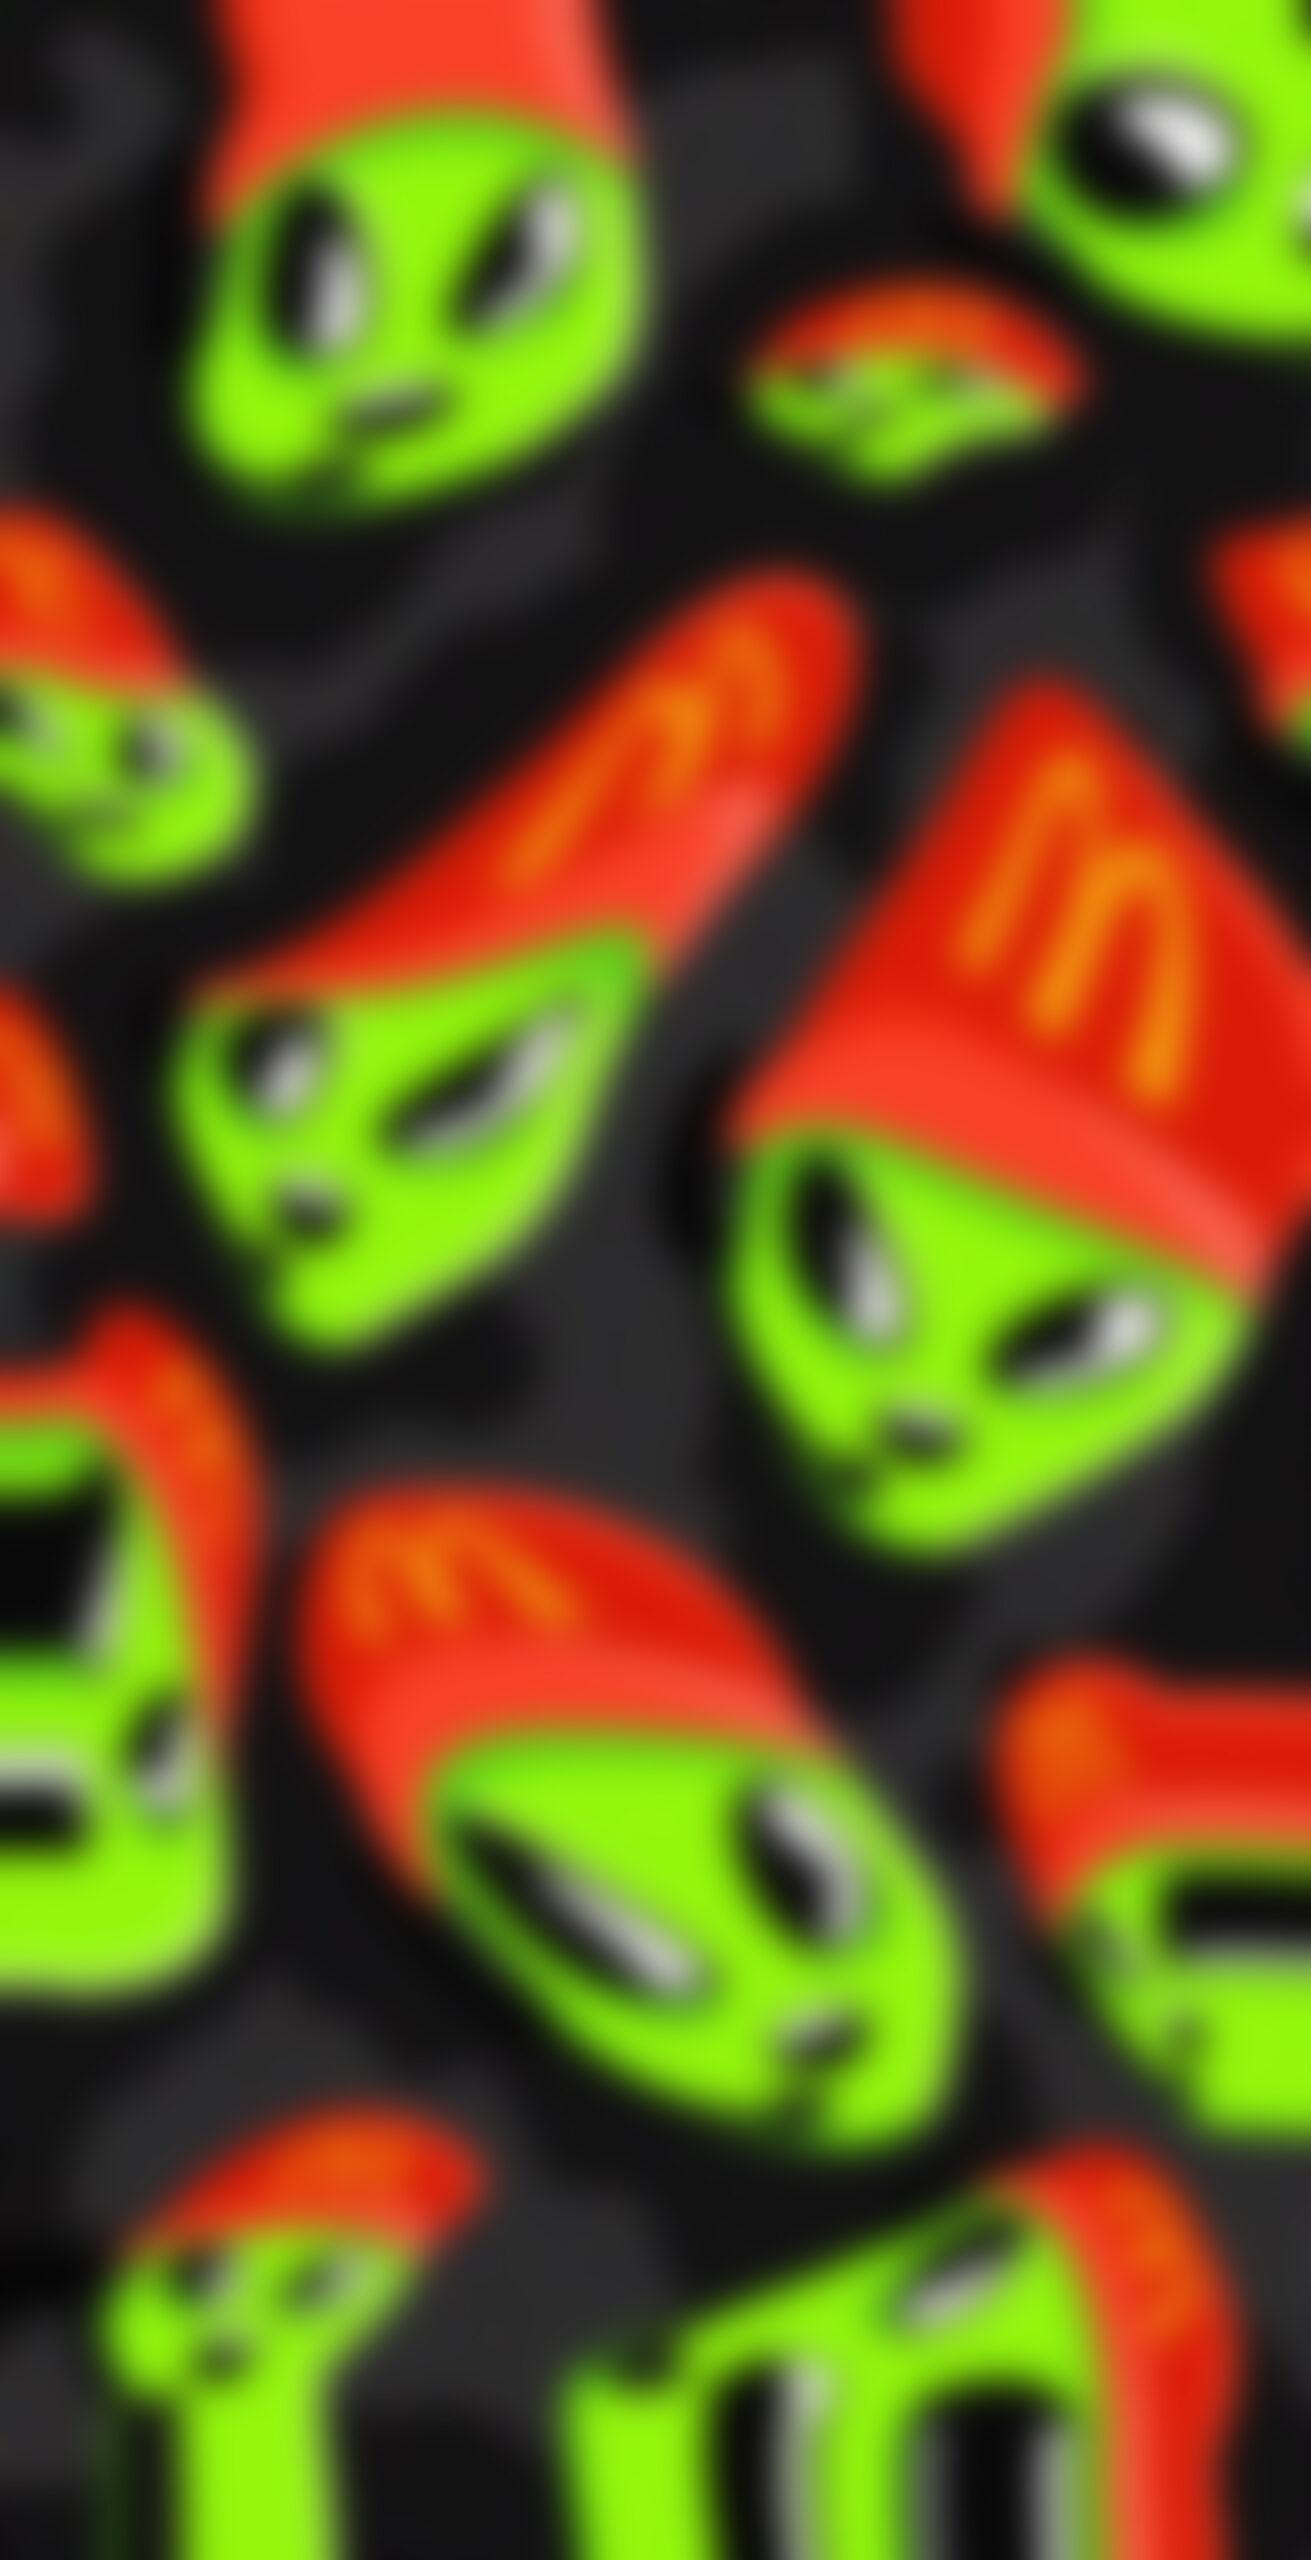 space green alien mcdonalds employee blur wallpaper